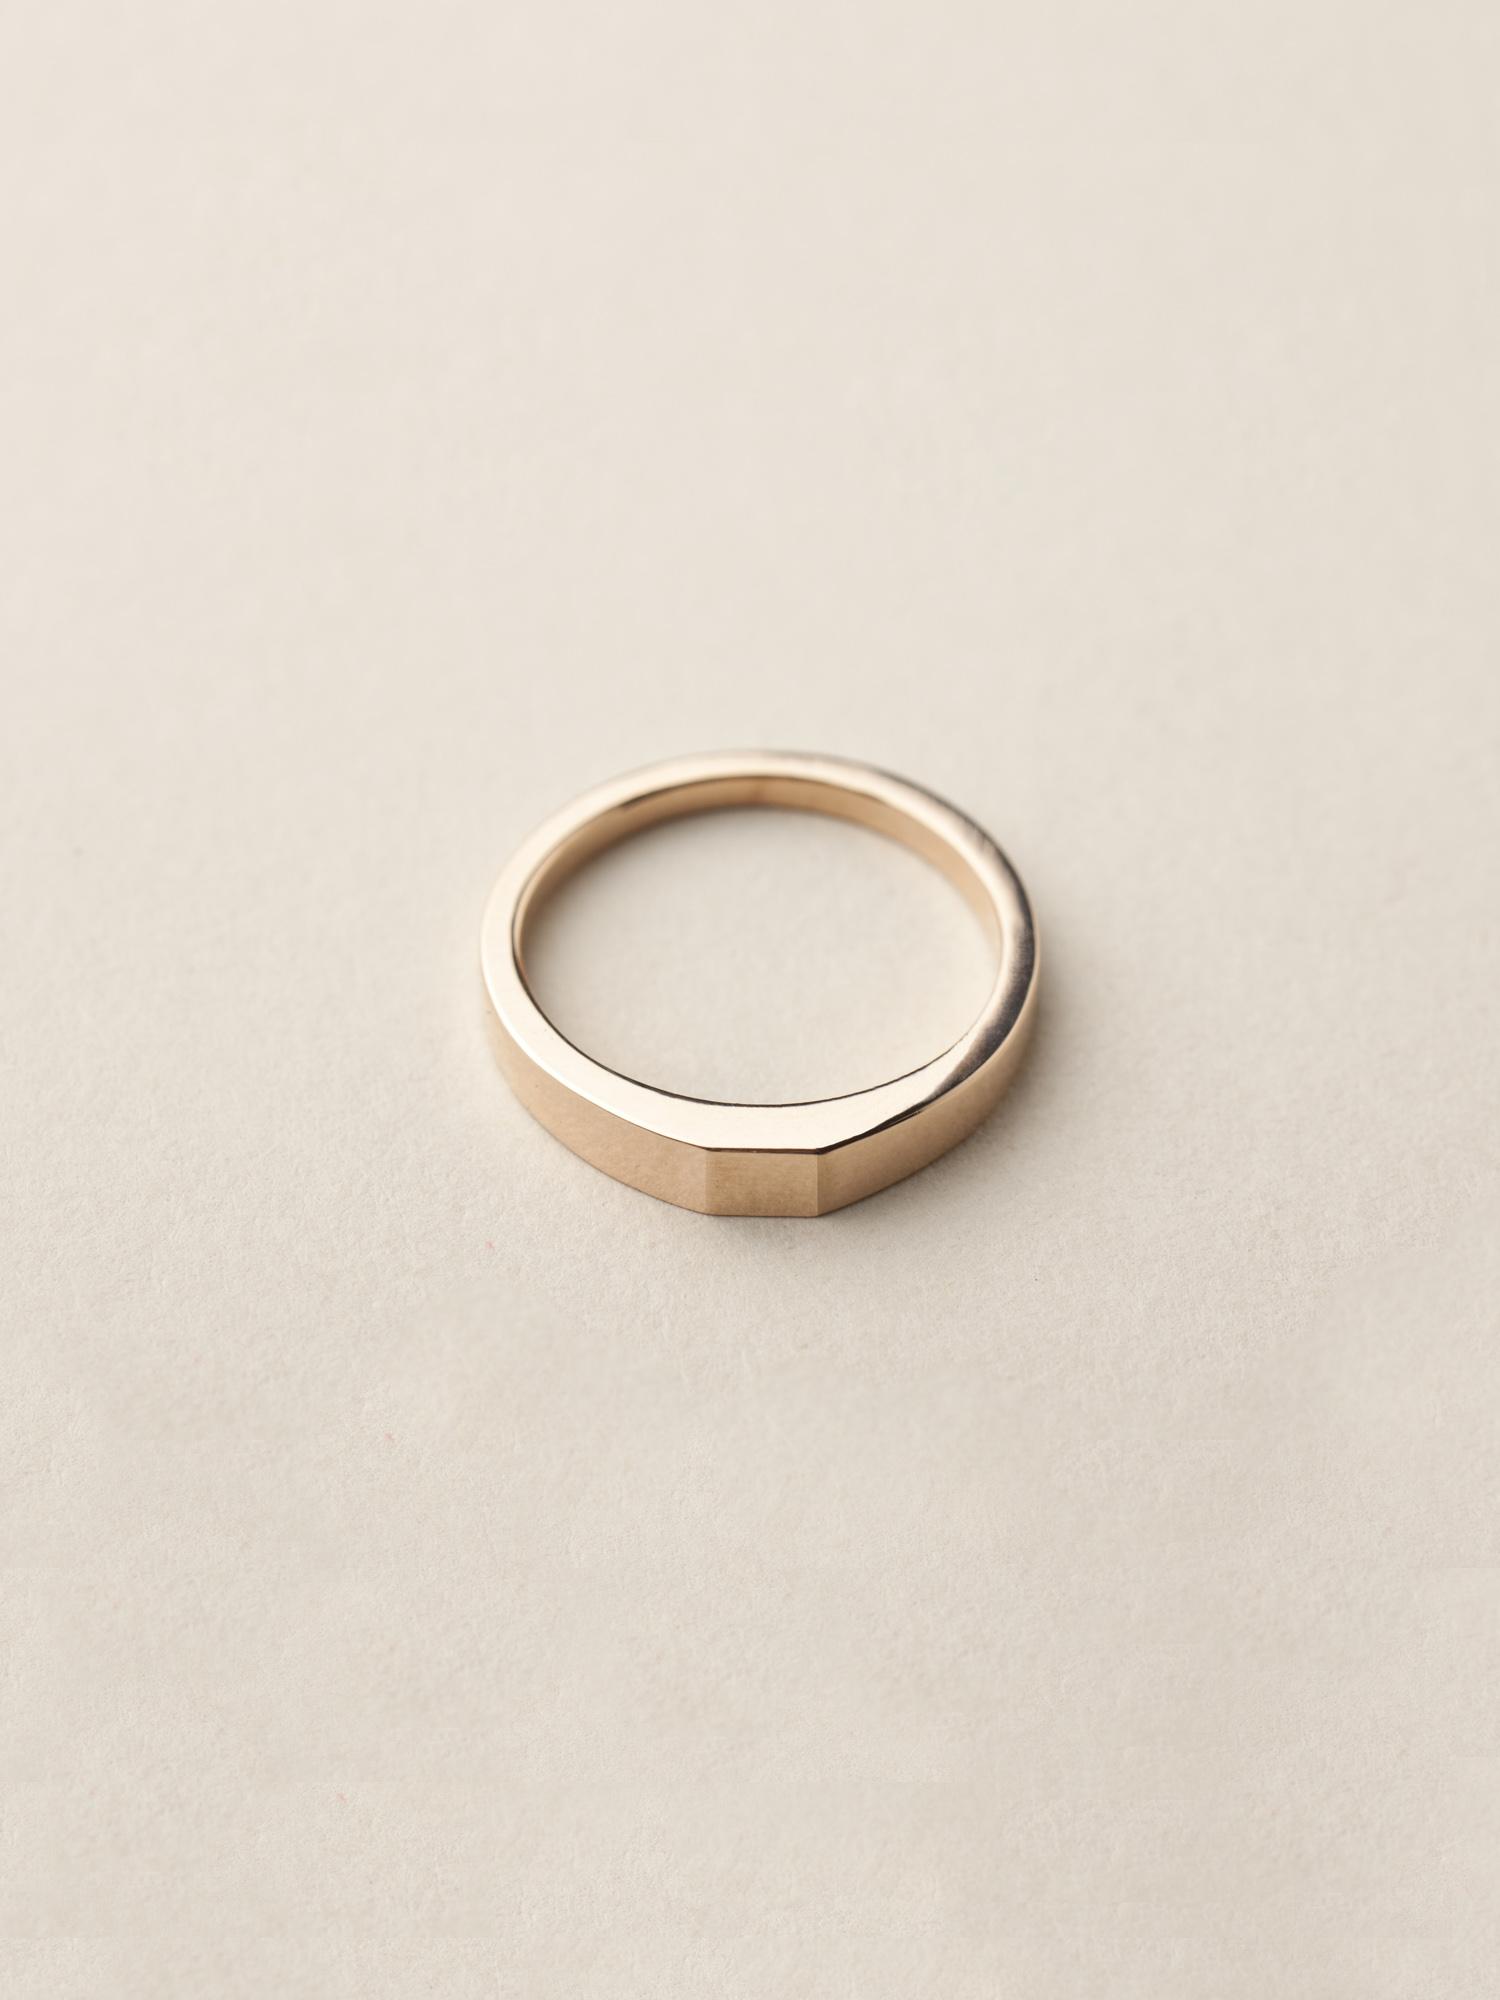 Siegelring Minima, klein quadratisch in 585 Rosegold  Signet ring Minima, small square in 14ct rose gold